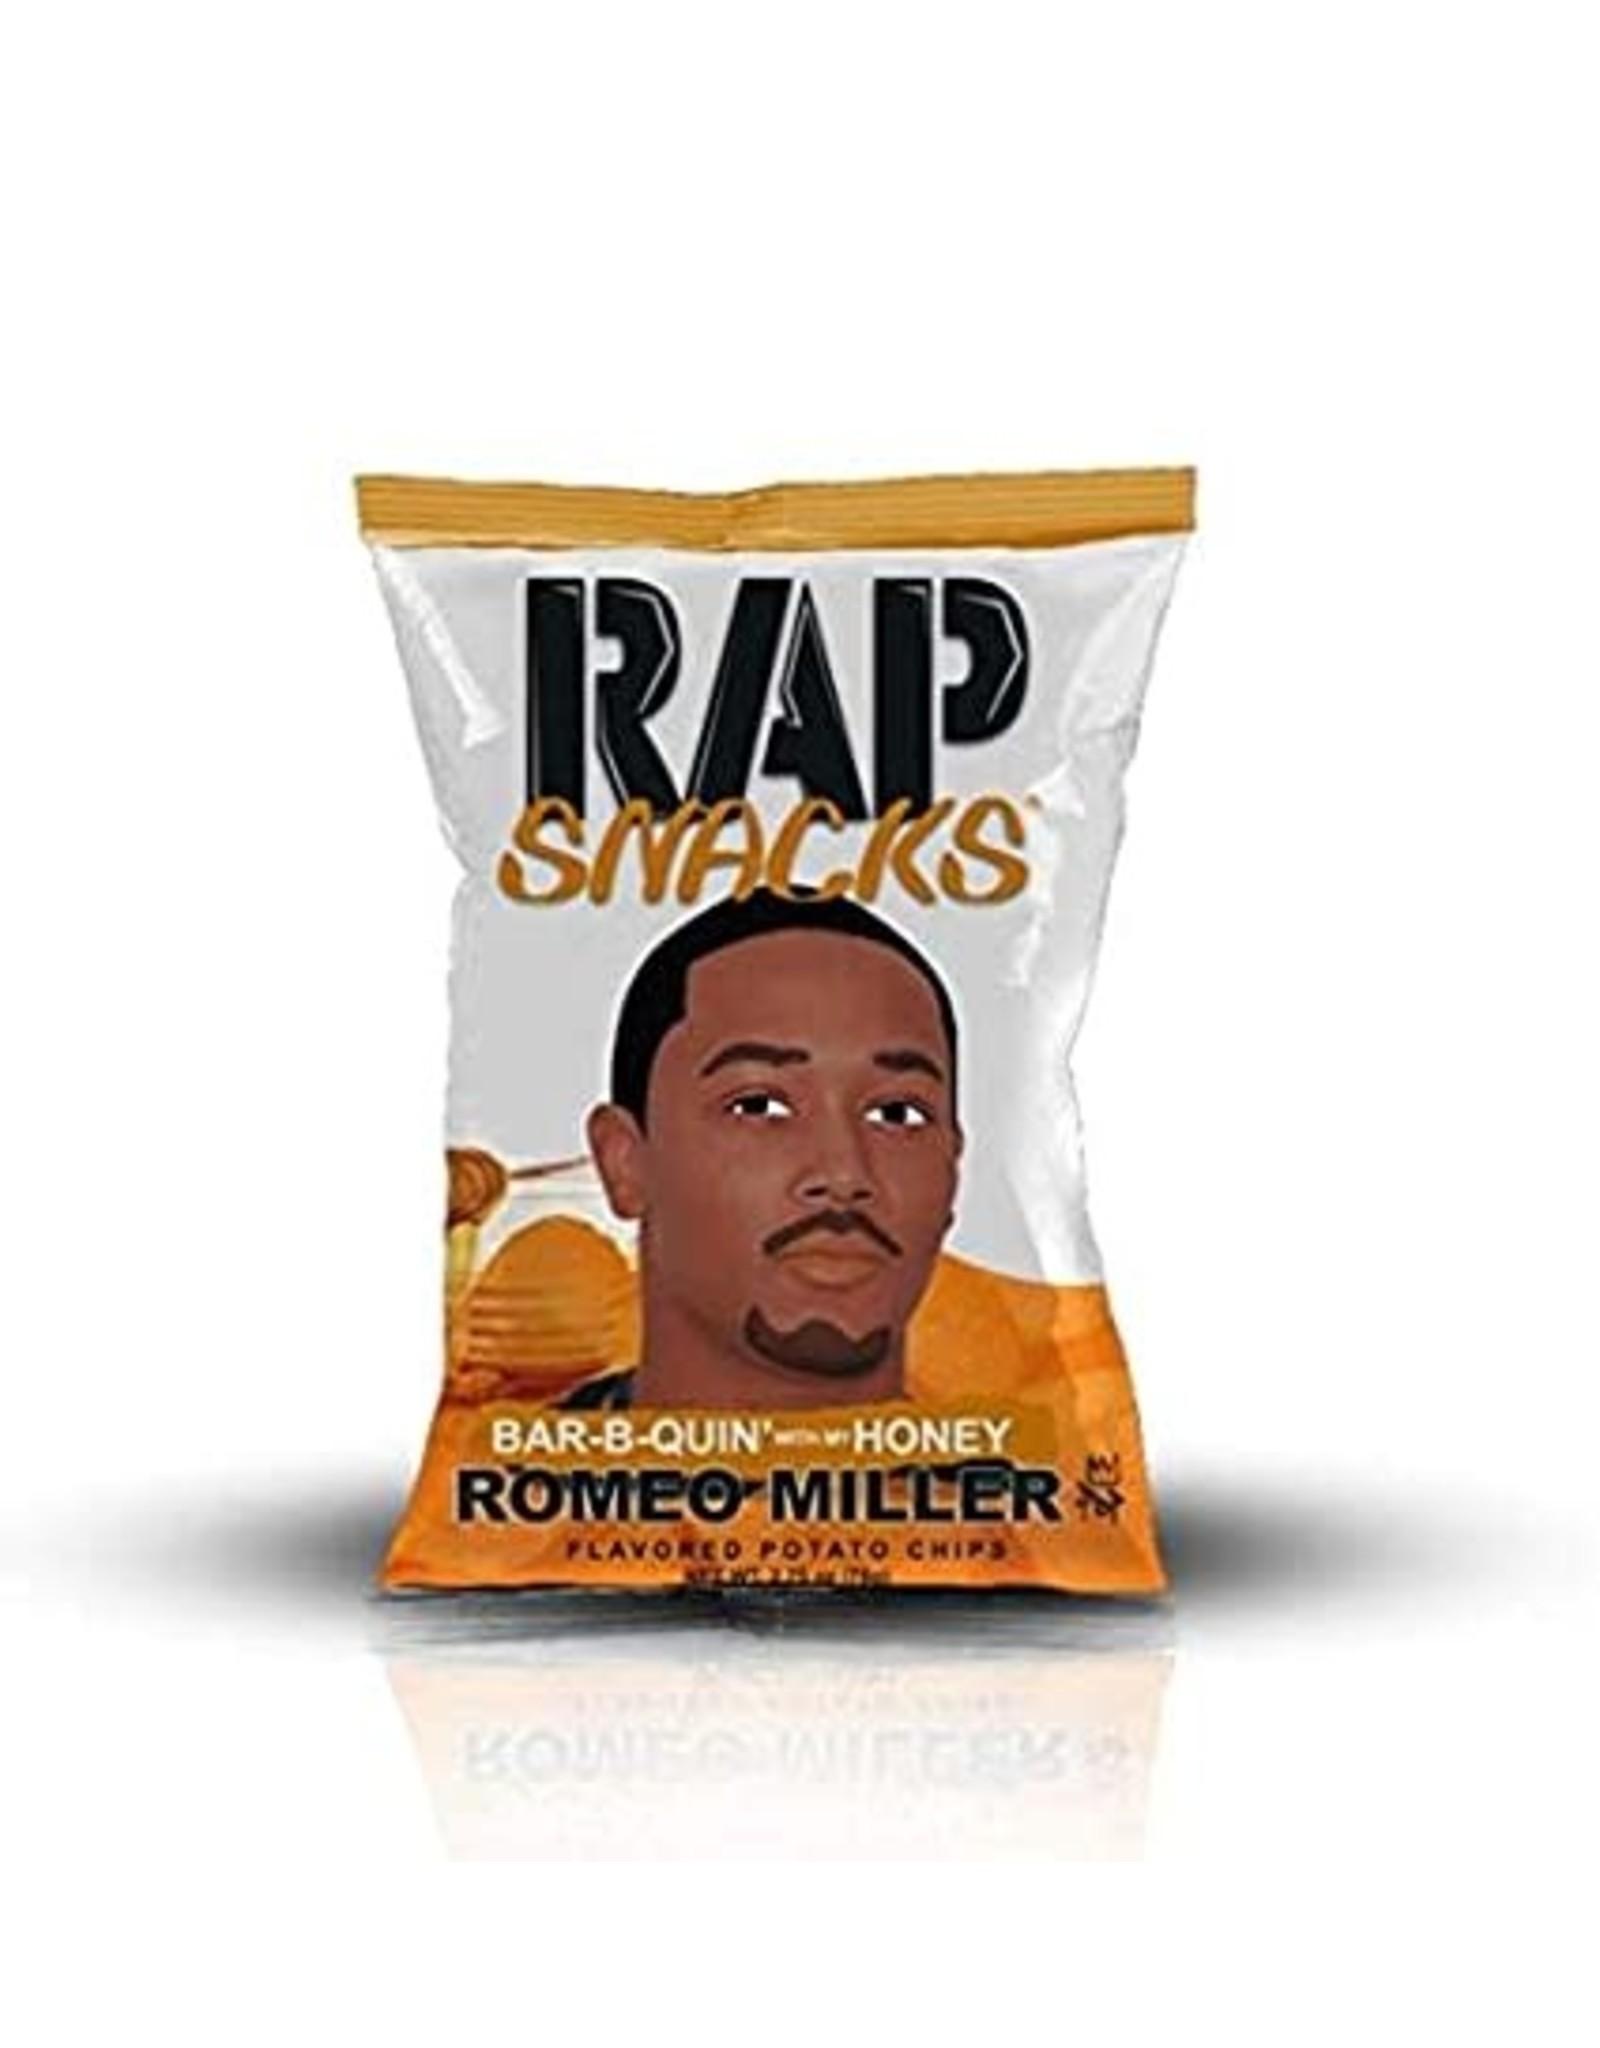 Rap Snacks - Romeo Miller - Bar-B-Quin' with my Honey - Potato Chips - 78g - BBD: 12/2020